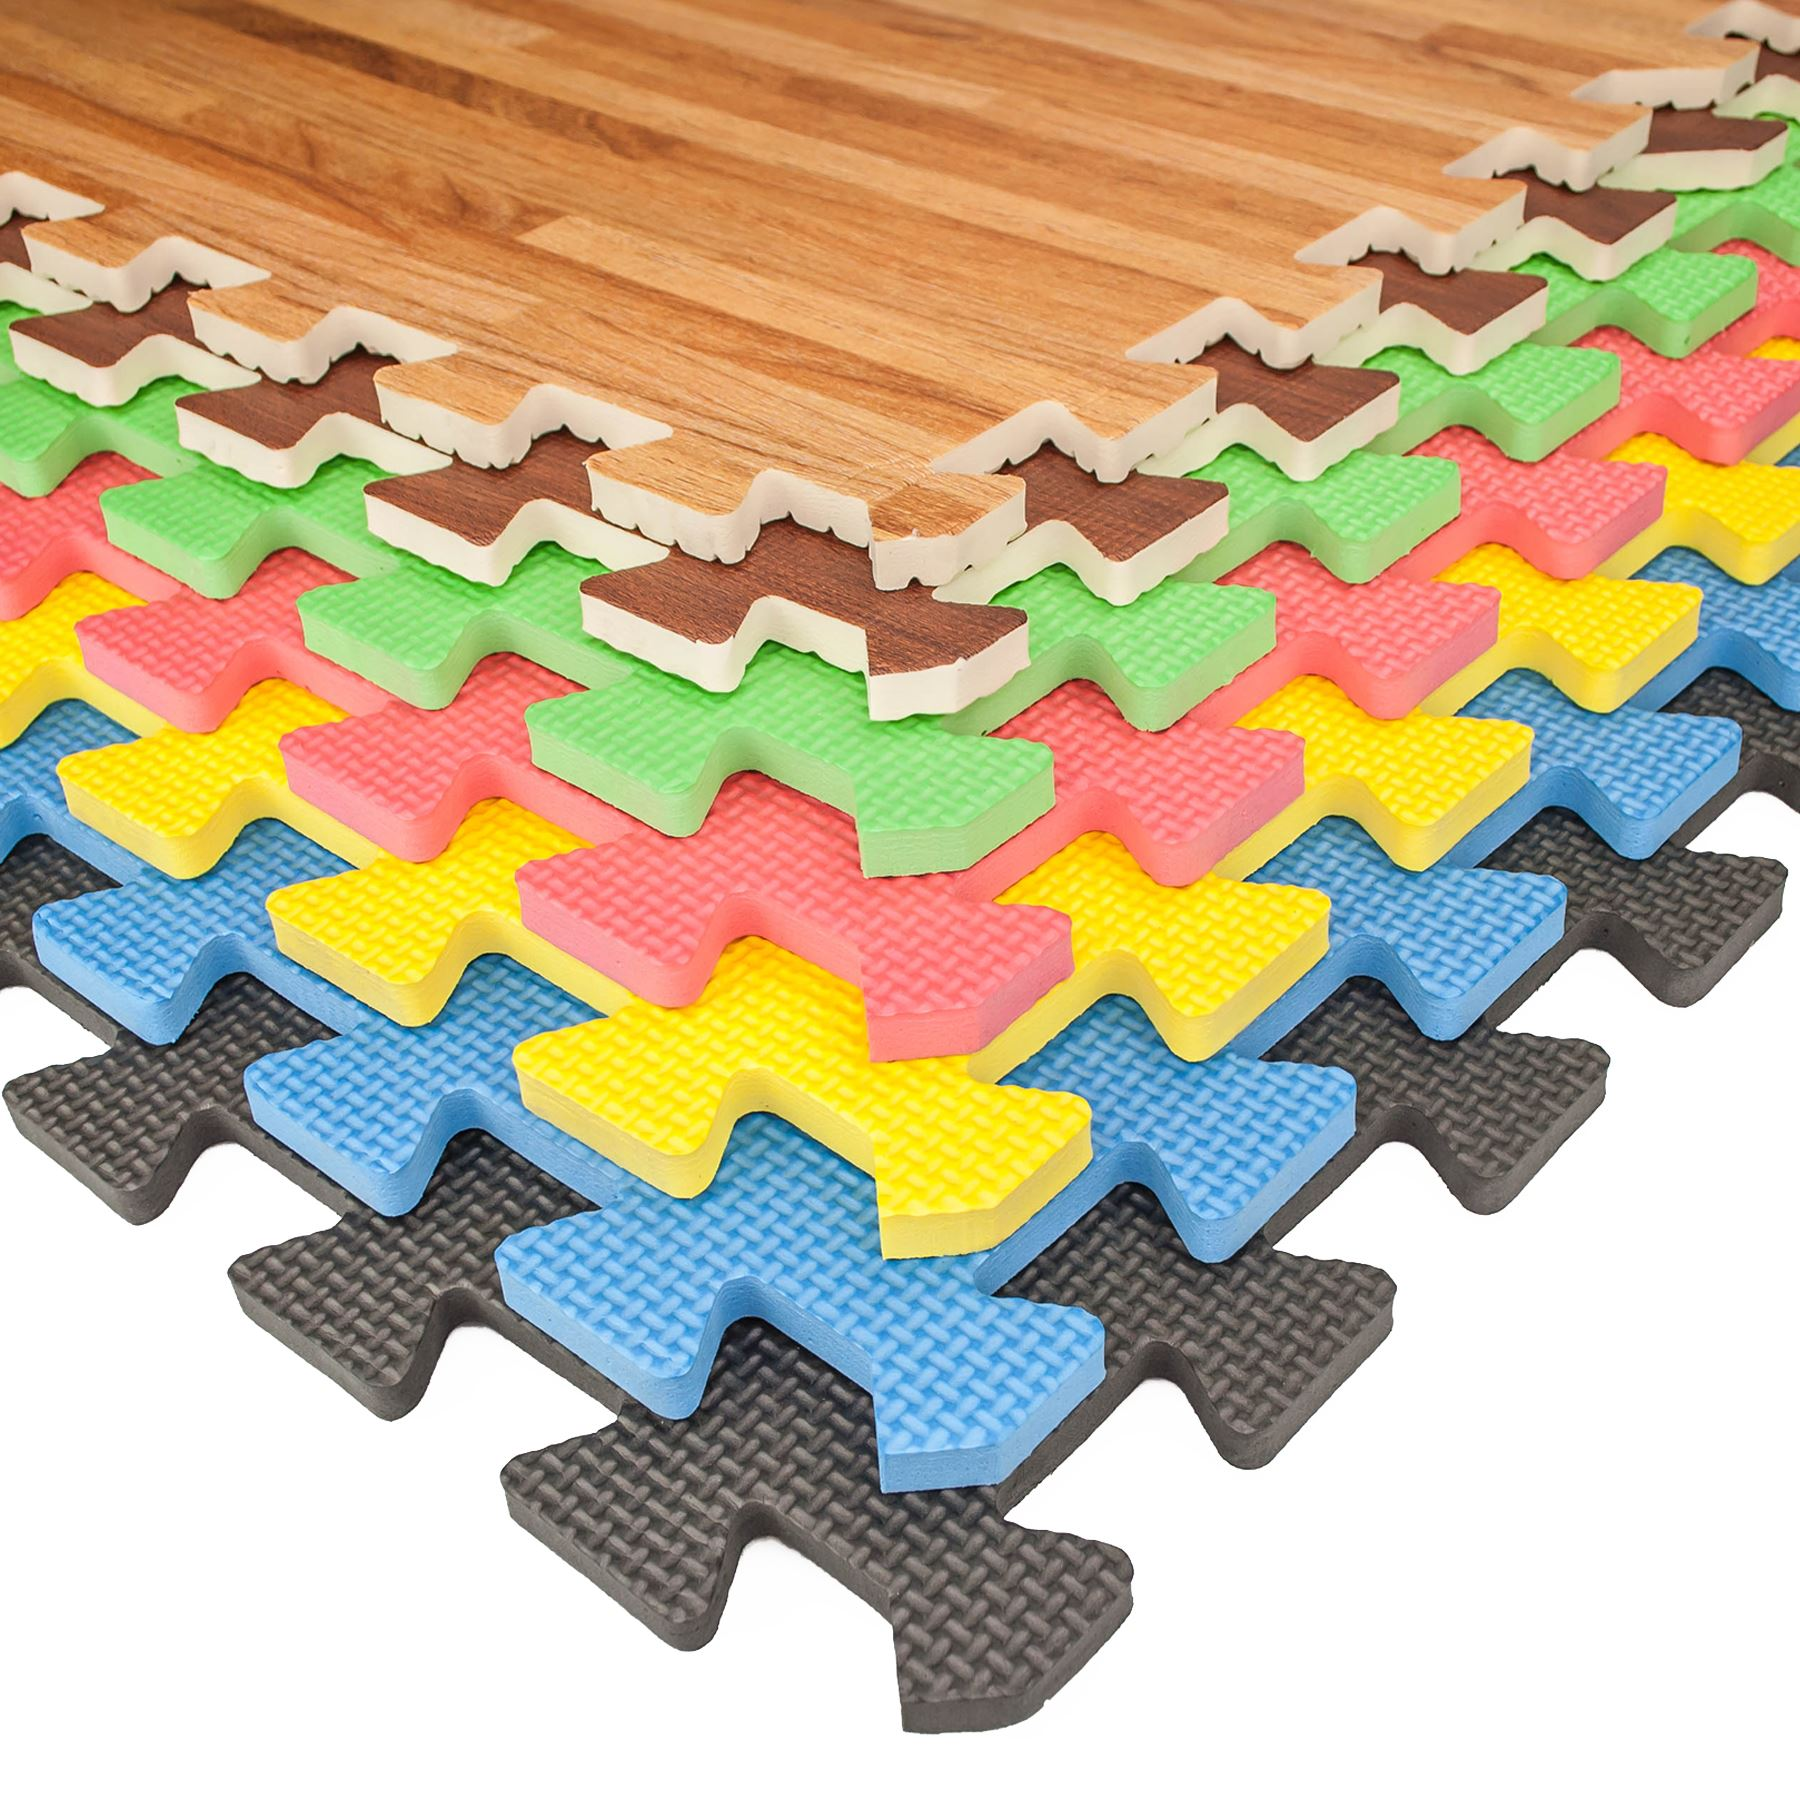 eva soft foam floor mats interlocking gym kids exercise play mat office garage ebay. Black Bedroom Furniture Sets. Home Design Ideas